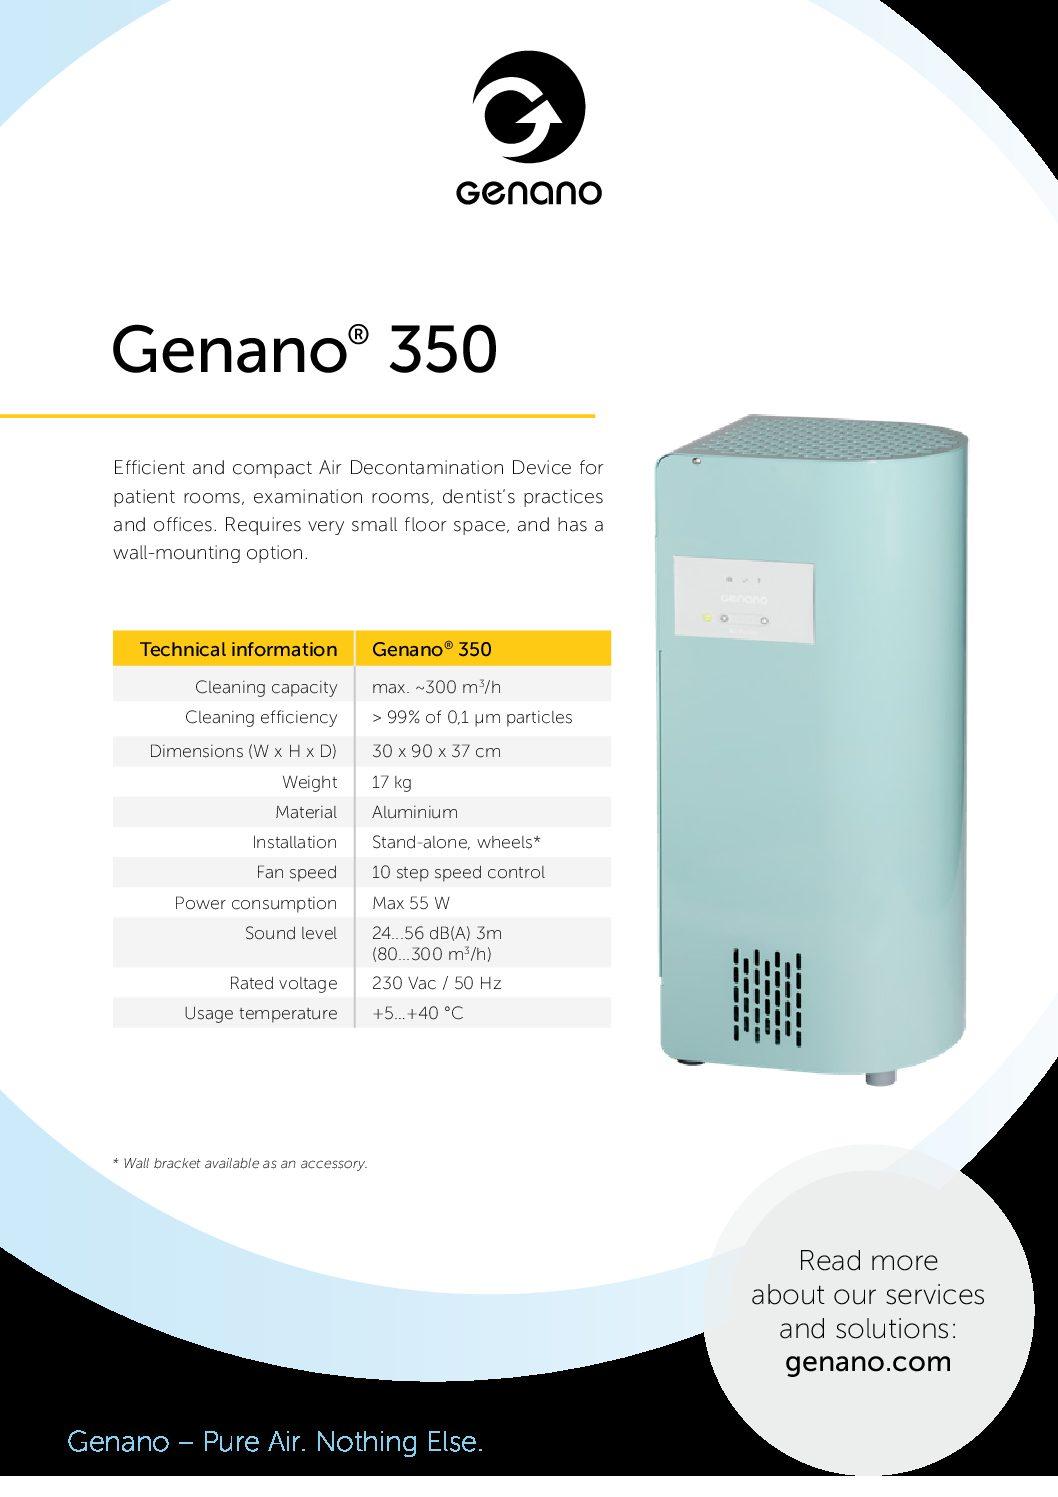 Genano - 350